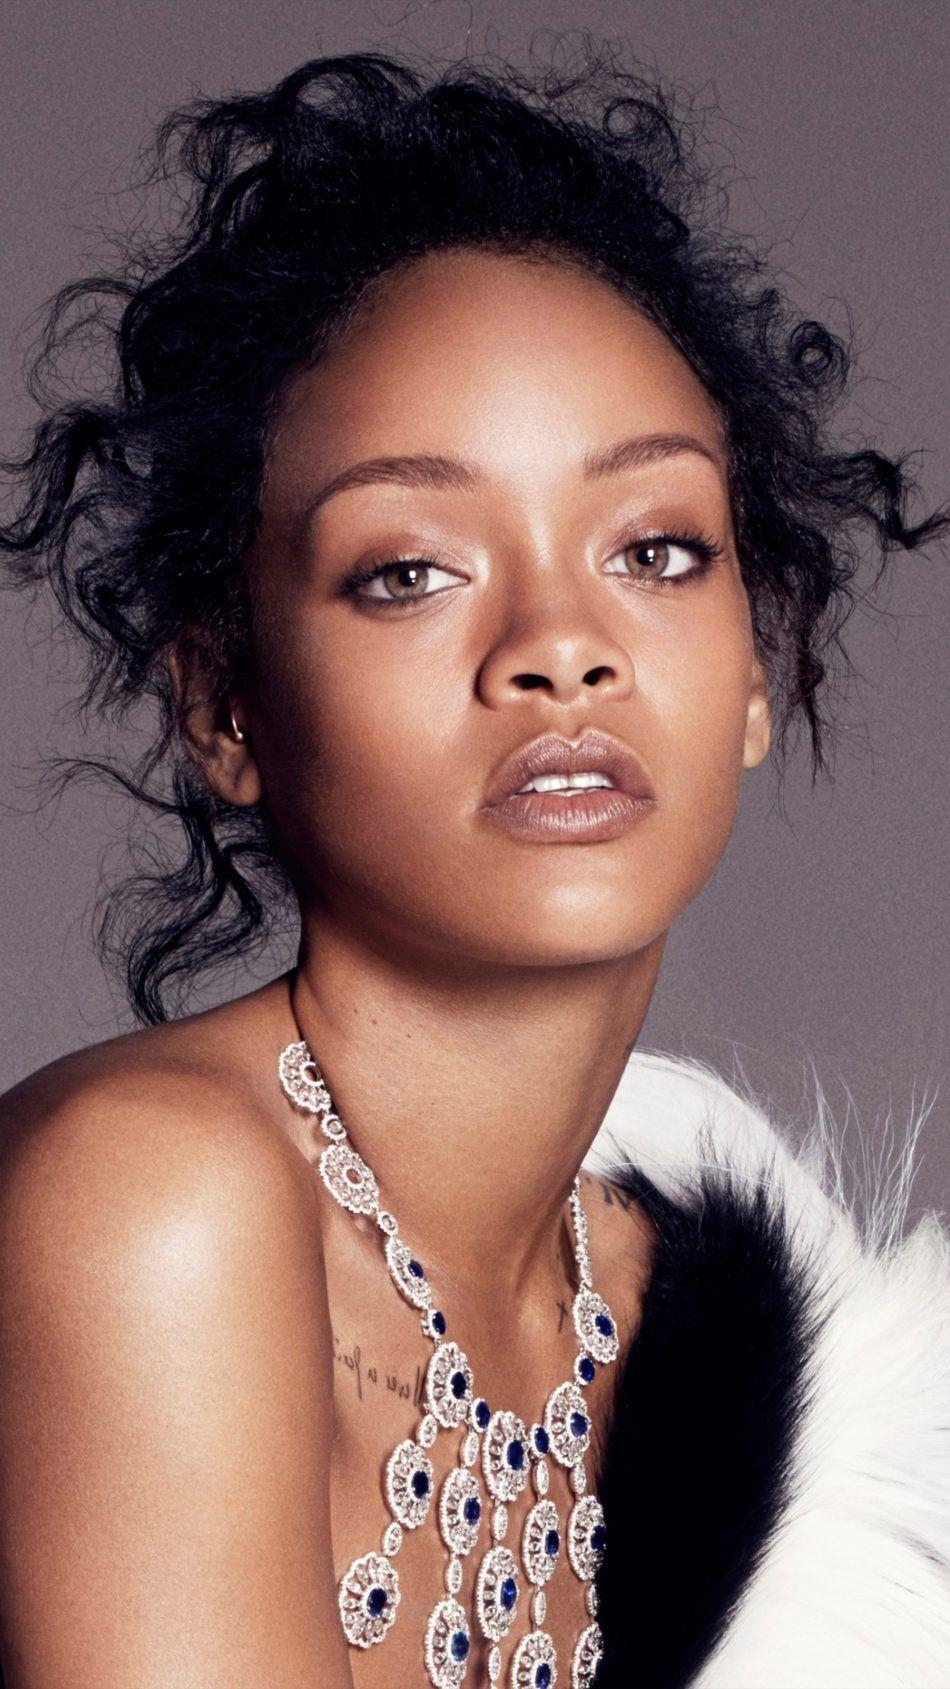 singer rihanna 2018 photoshoot | celebrity wallpapers